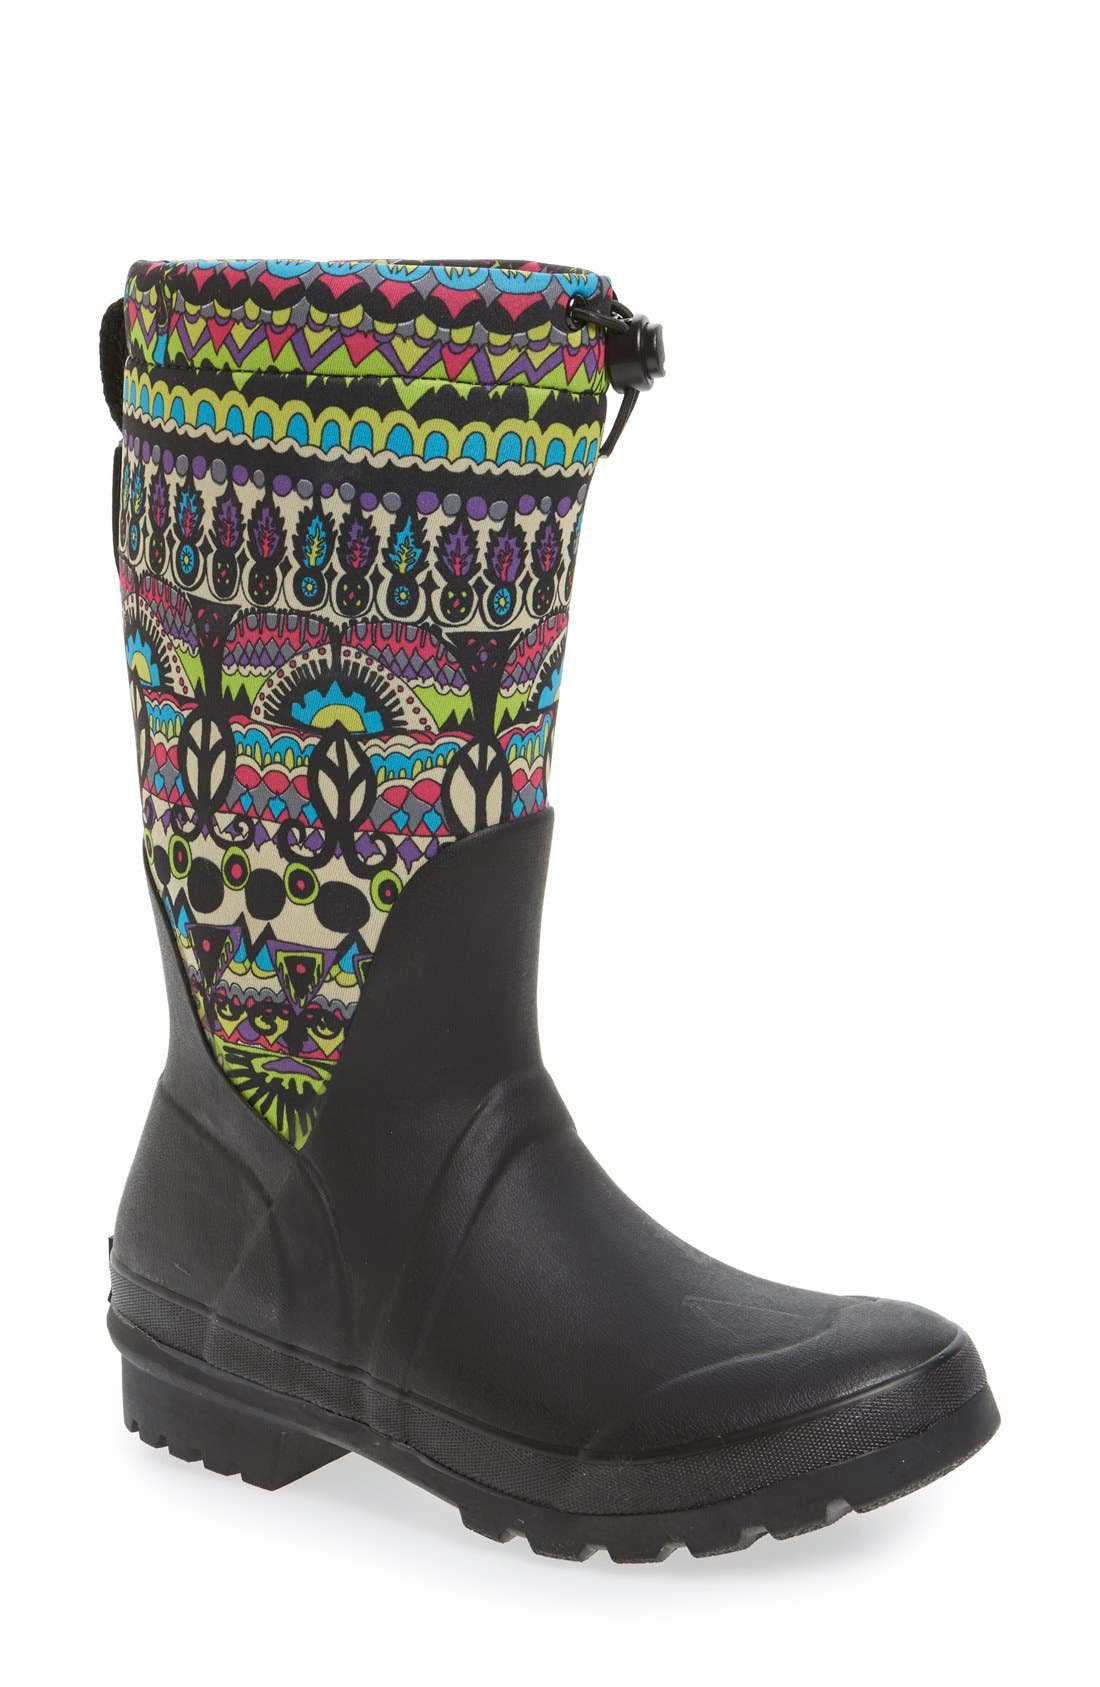 Main Image - Sakroots 'Mezzo' Waterproof Rain Boot (Women)